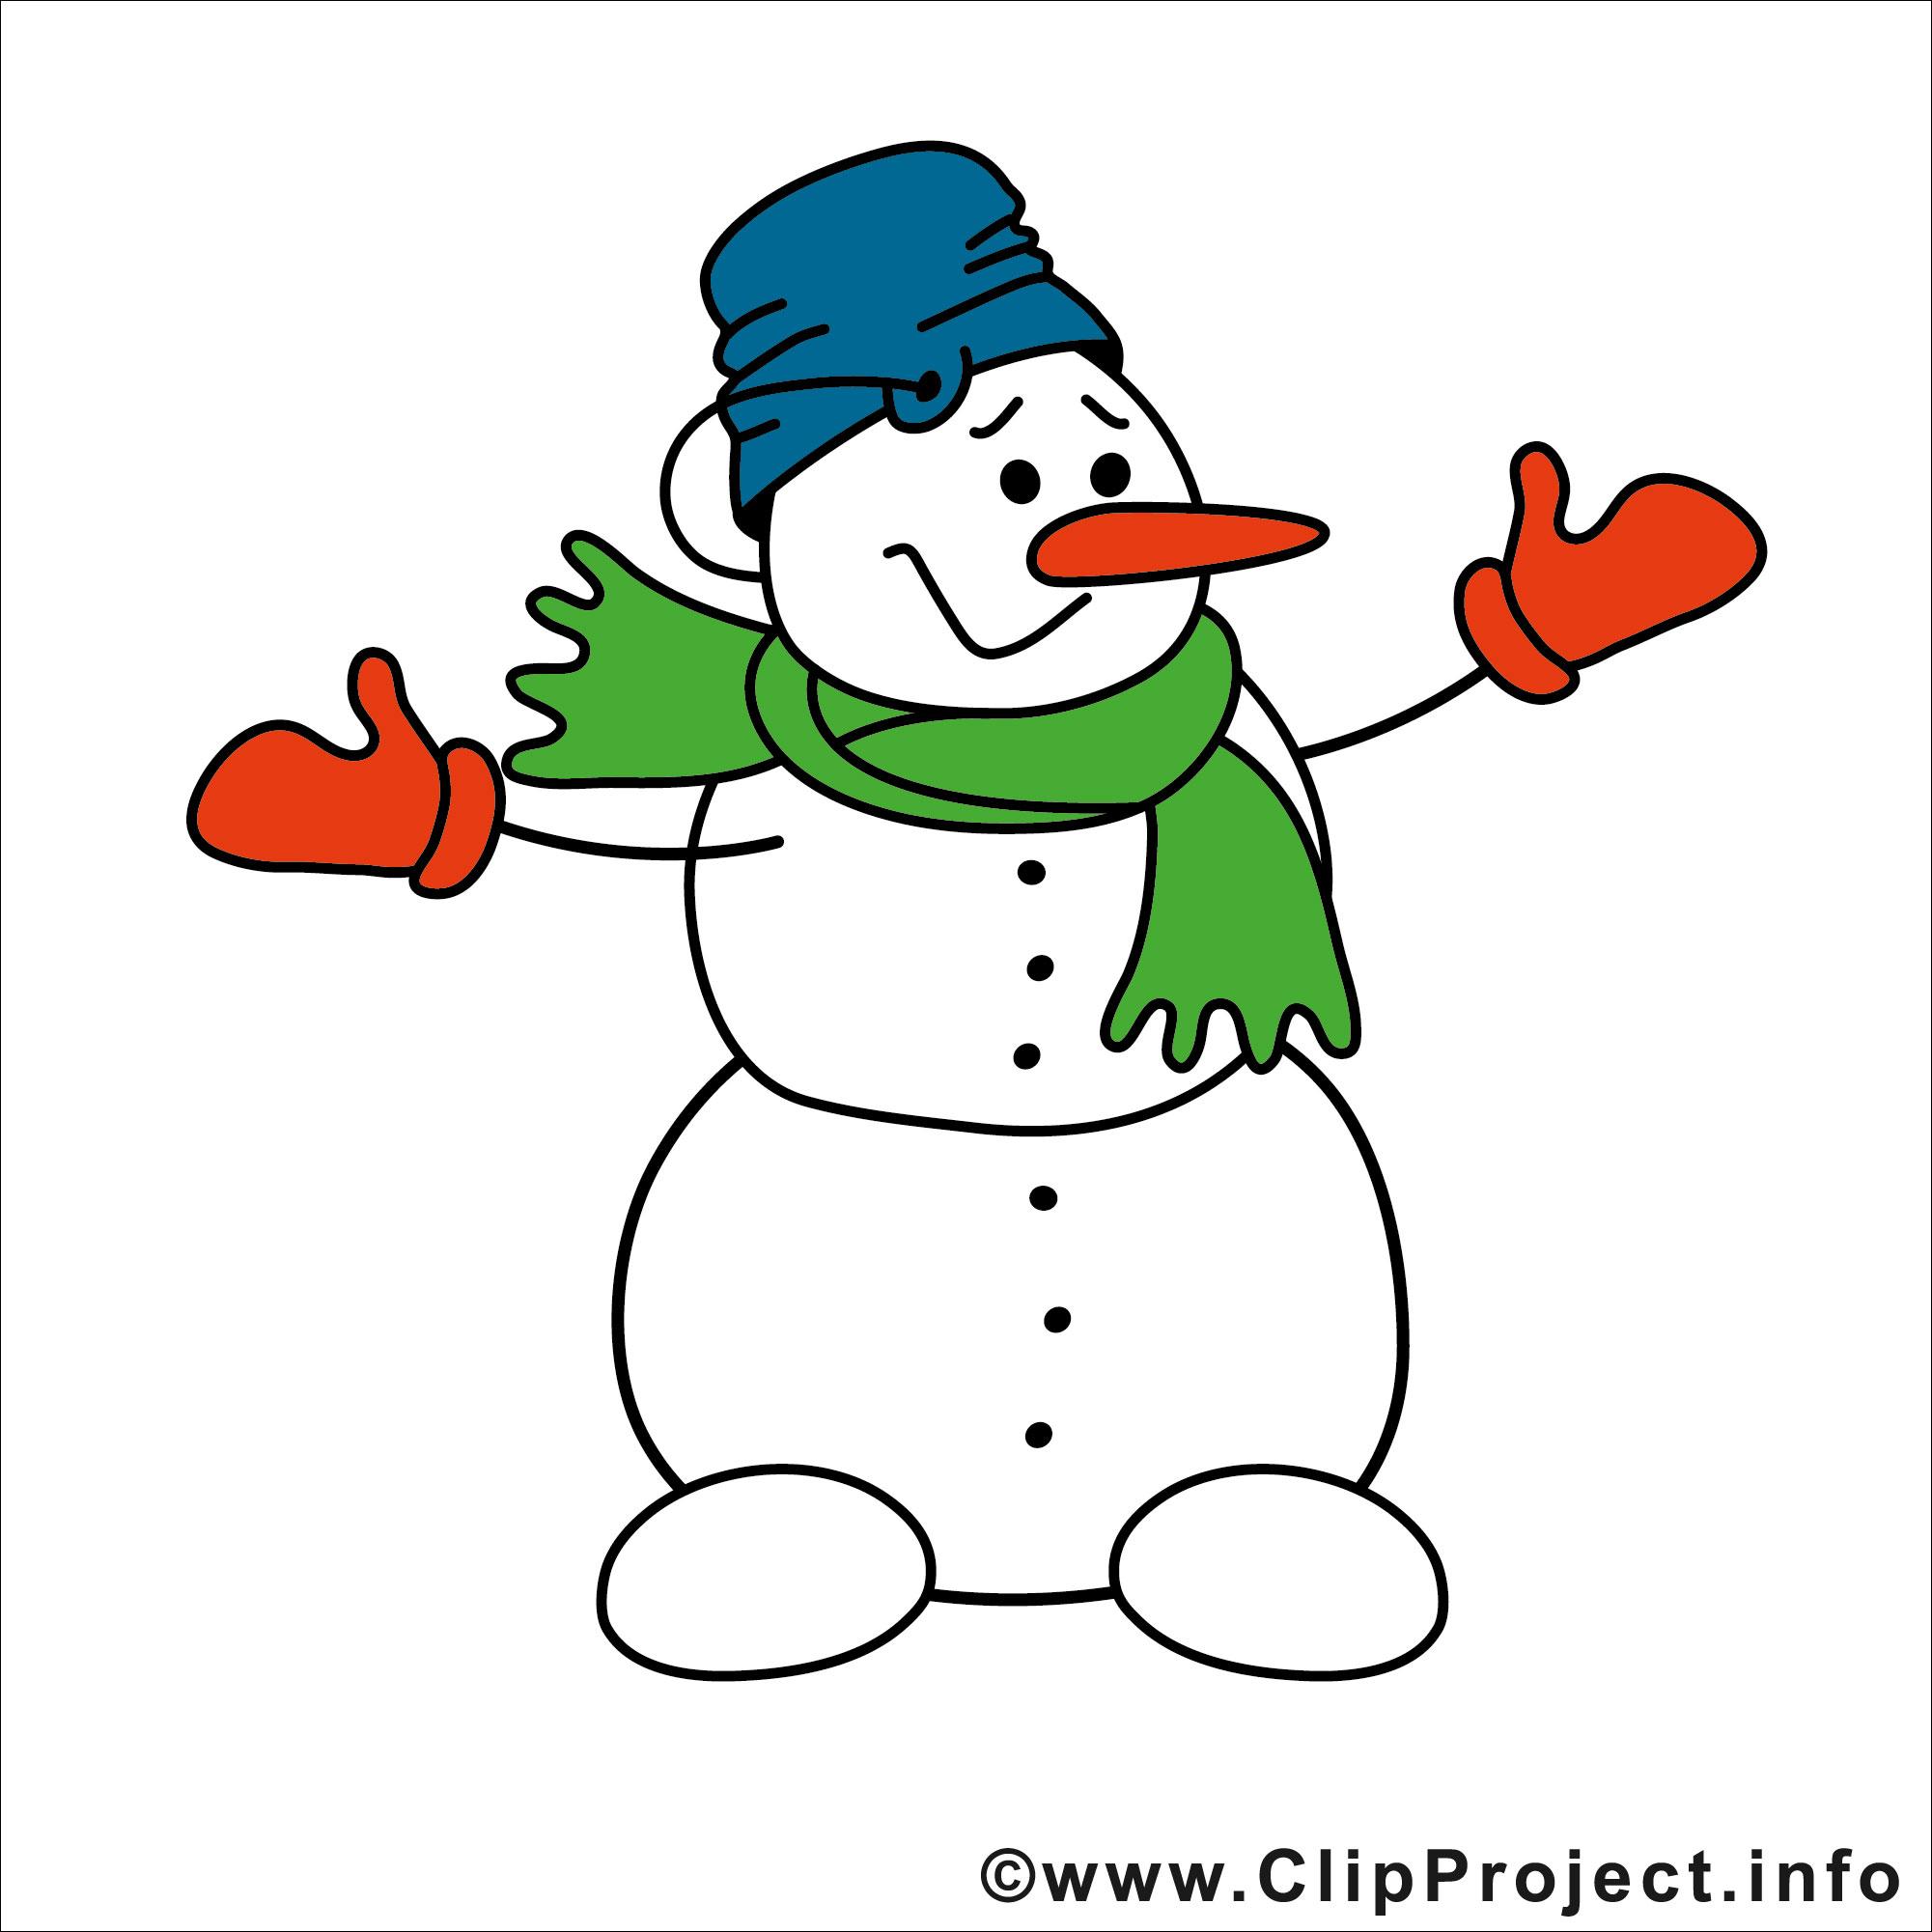 Clipart Menu Noel Gratuit